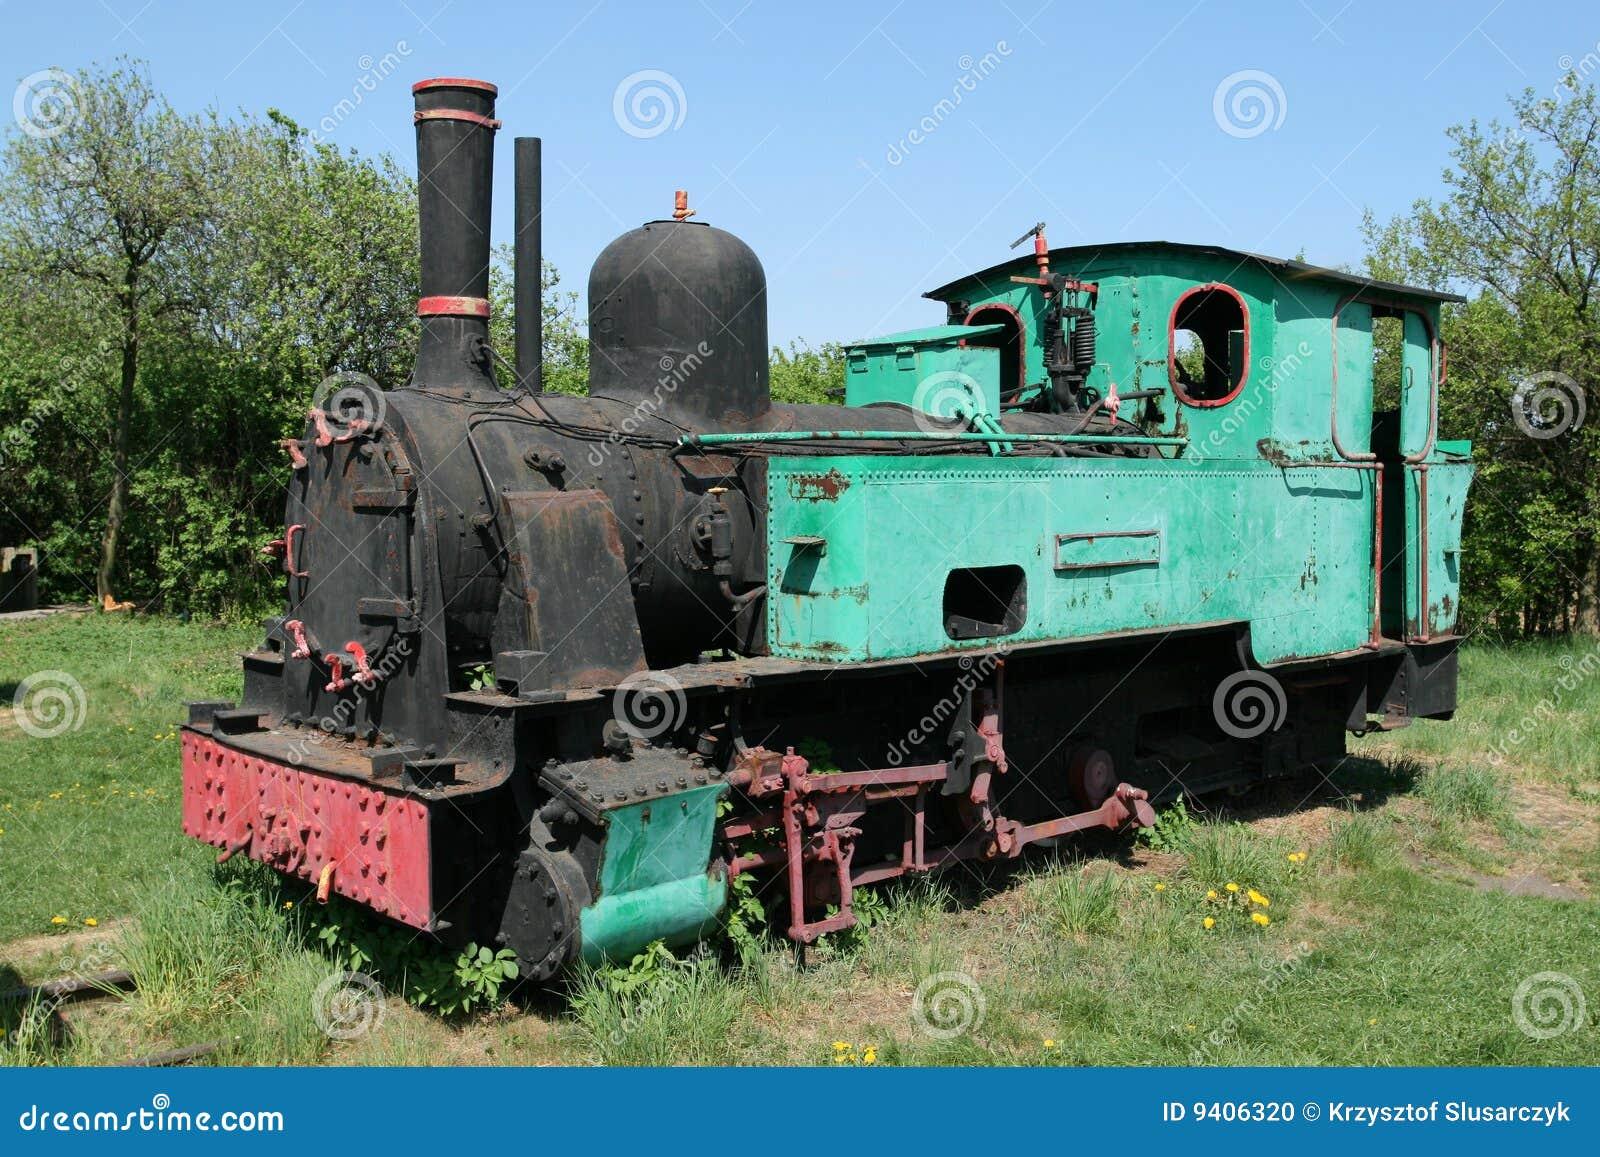 Vintage Steam Engines 67